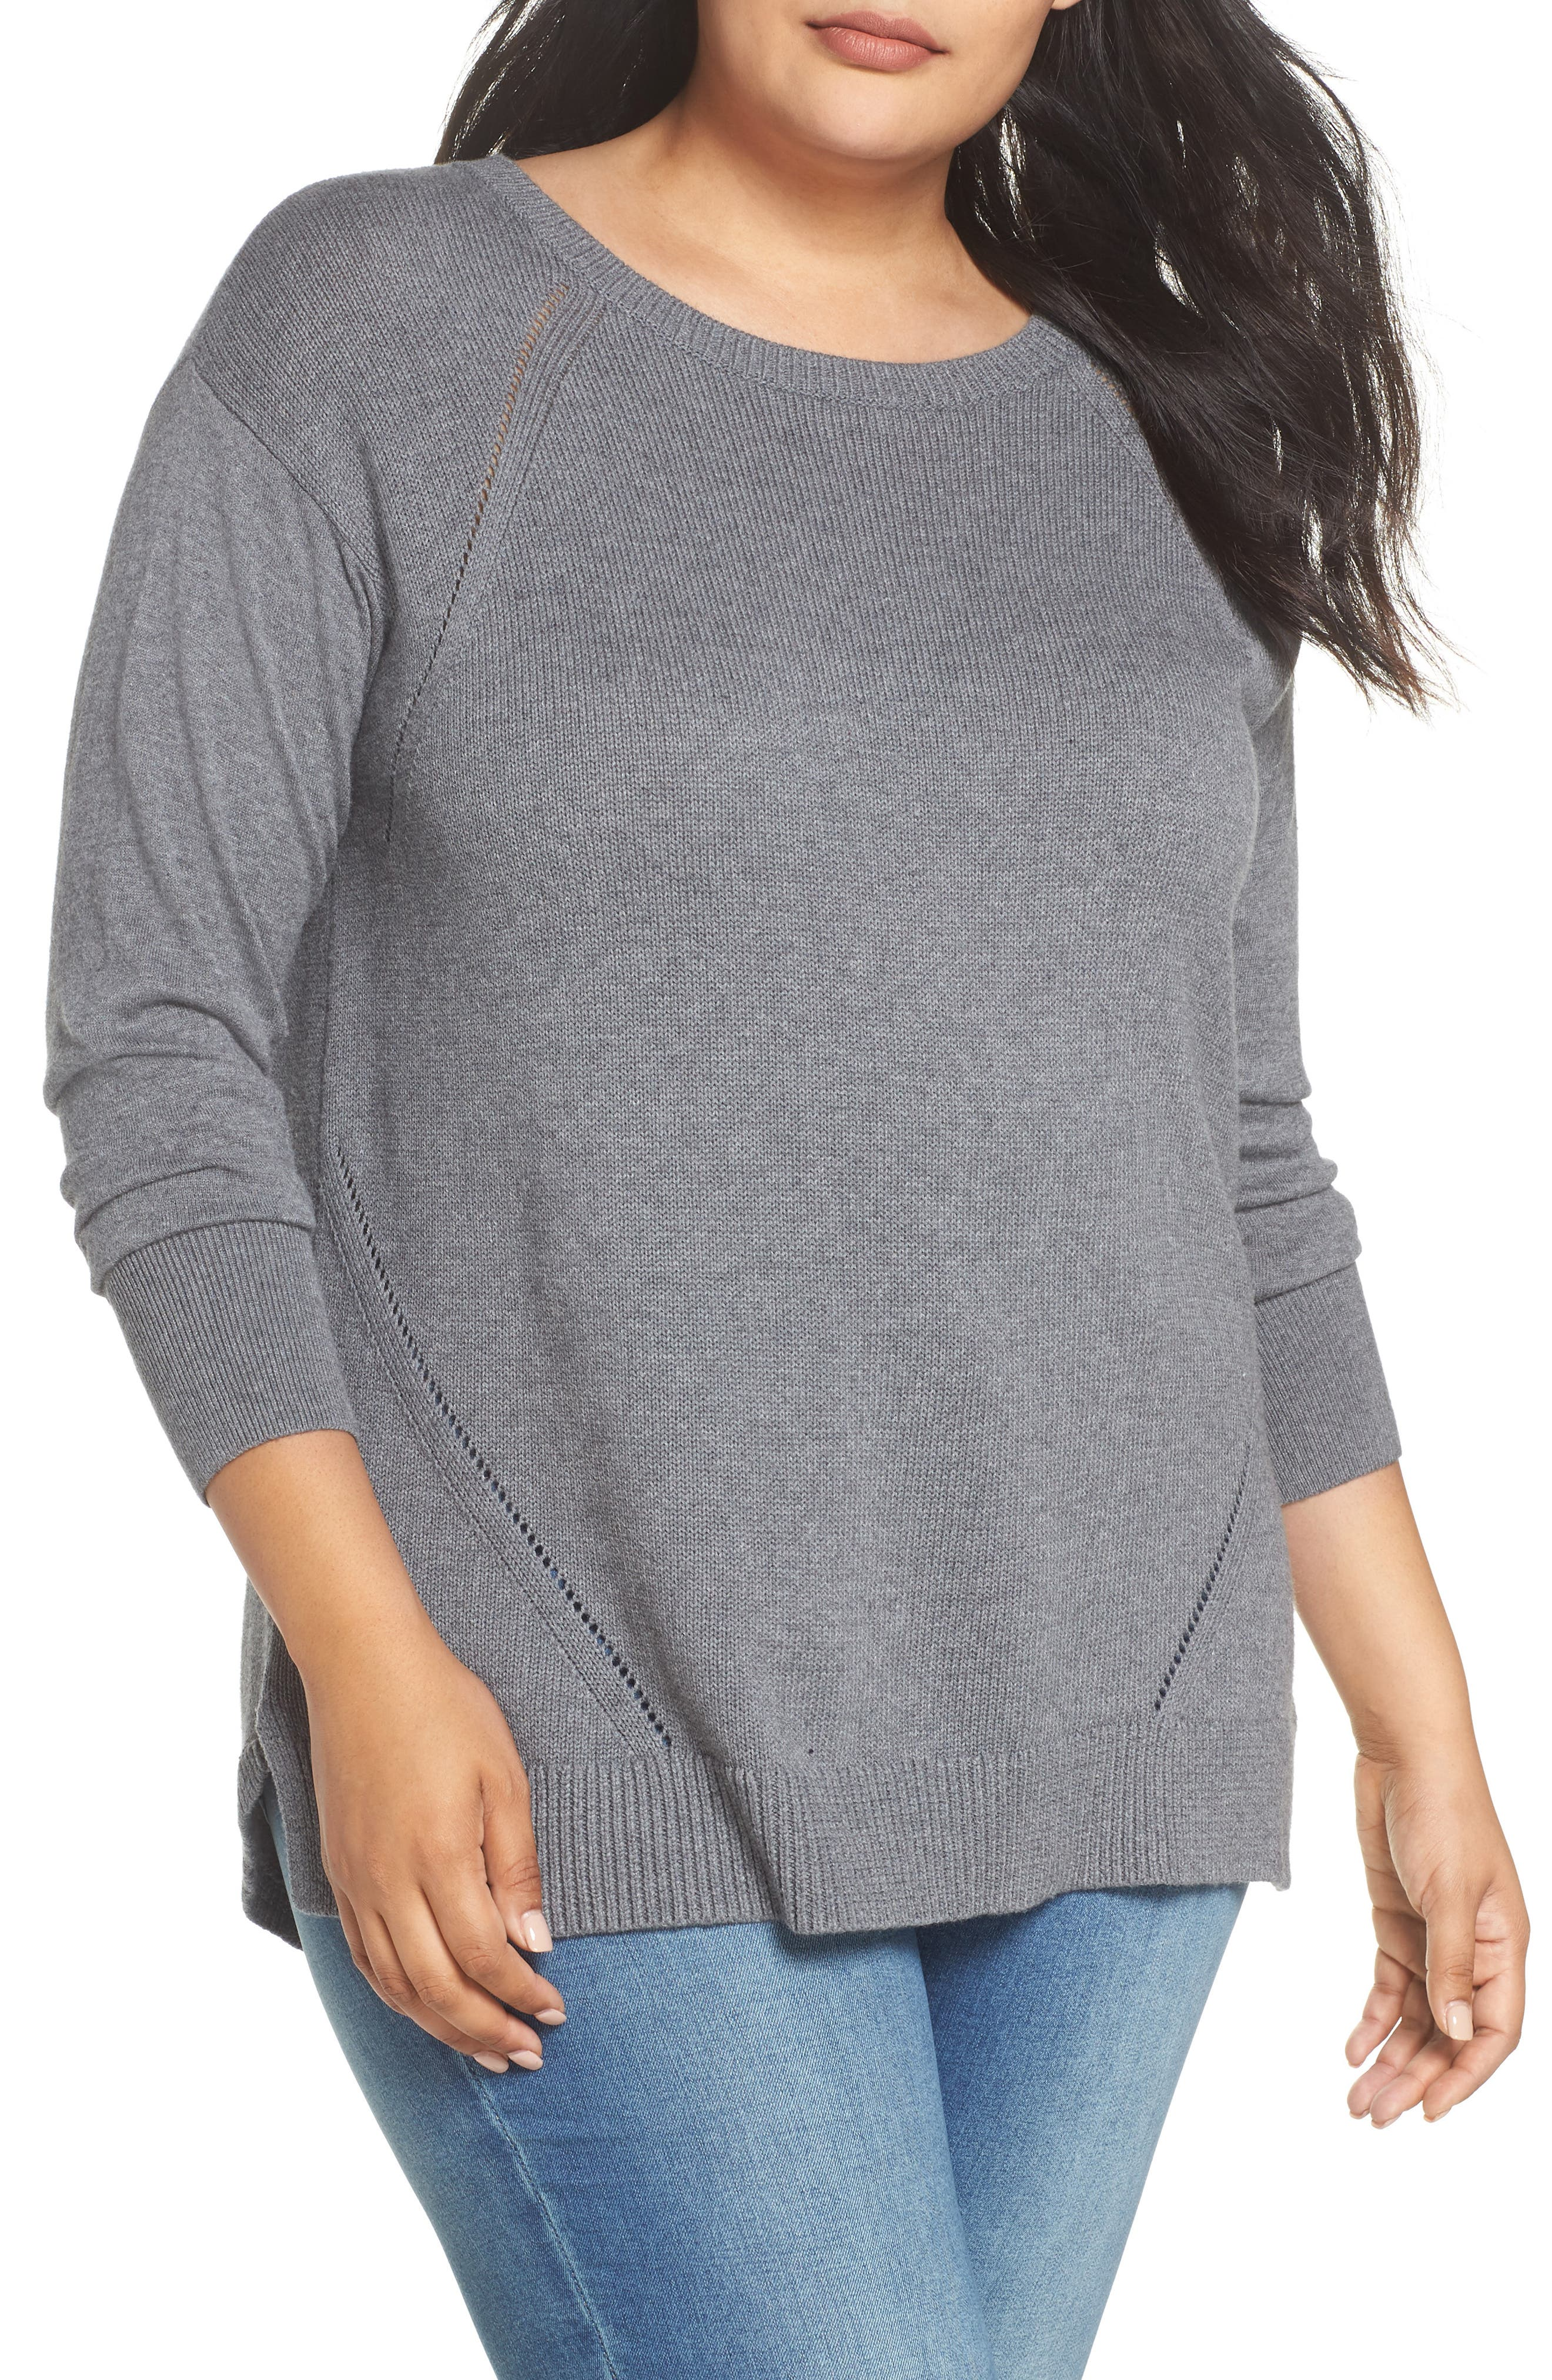 Button Back Tunic Sweater,                             Main thumbnail 1, color,                             GREY DARK HEATHER